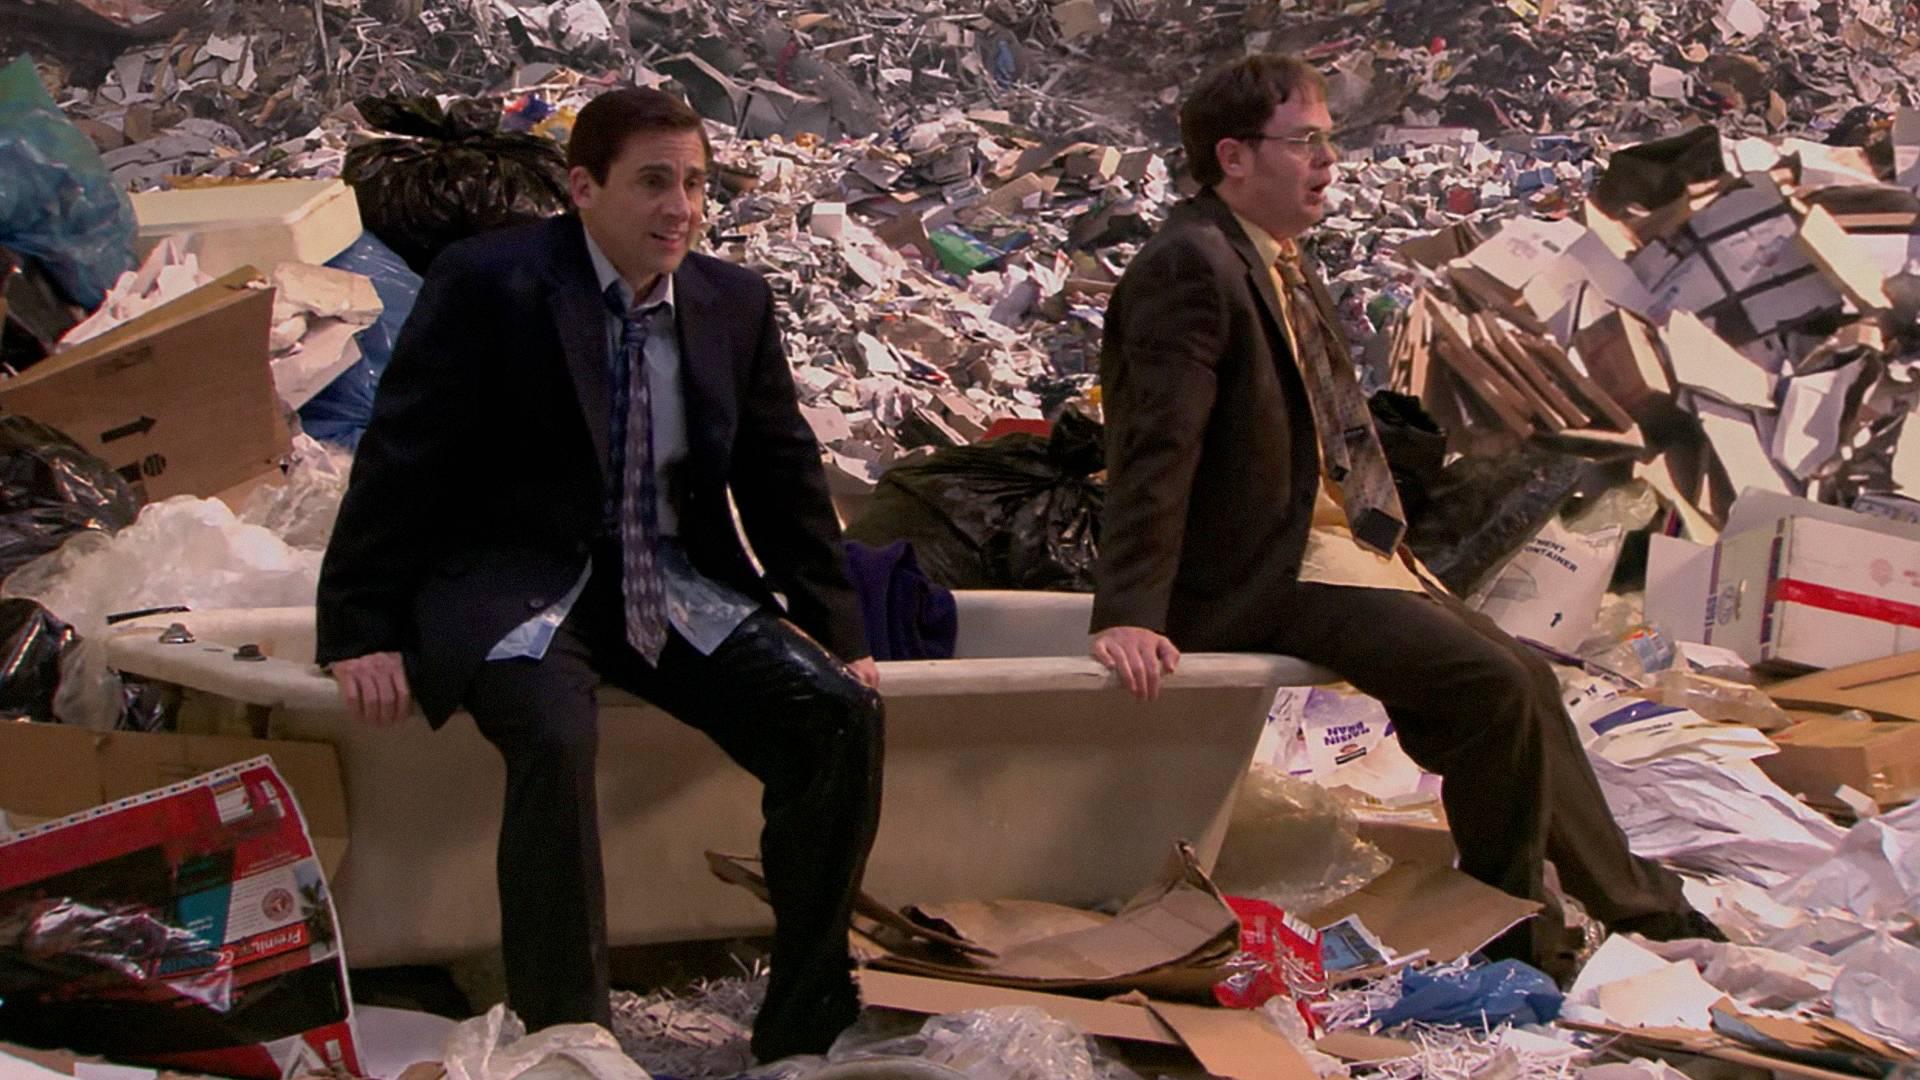 The Office Season 6 Episode 20